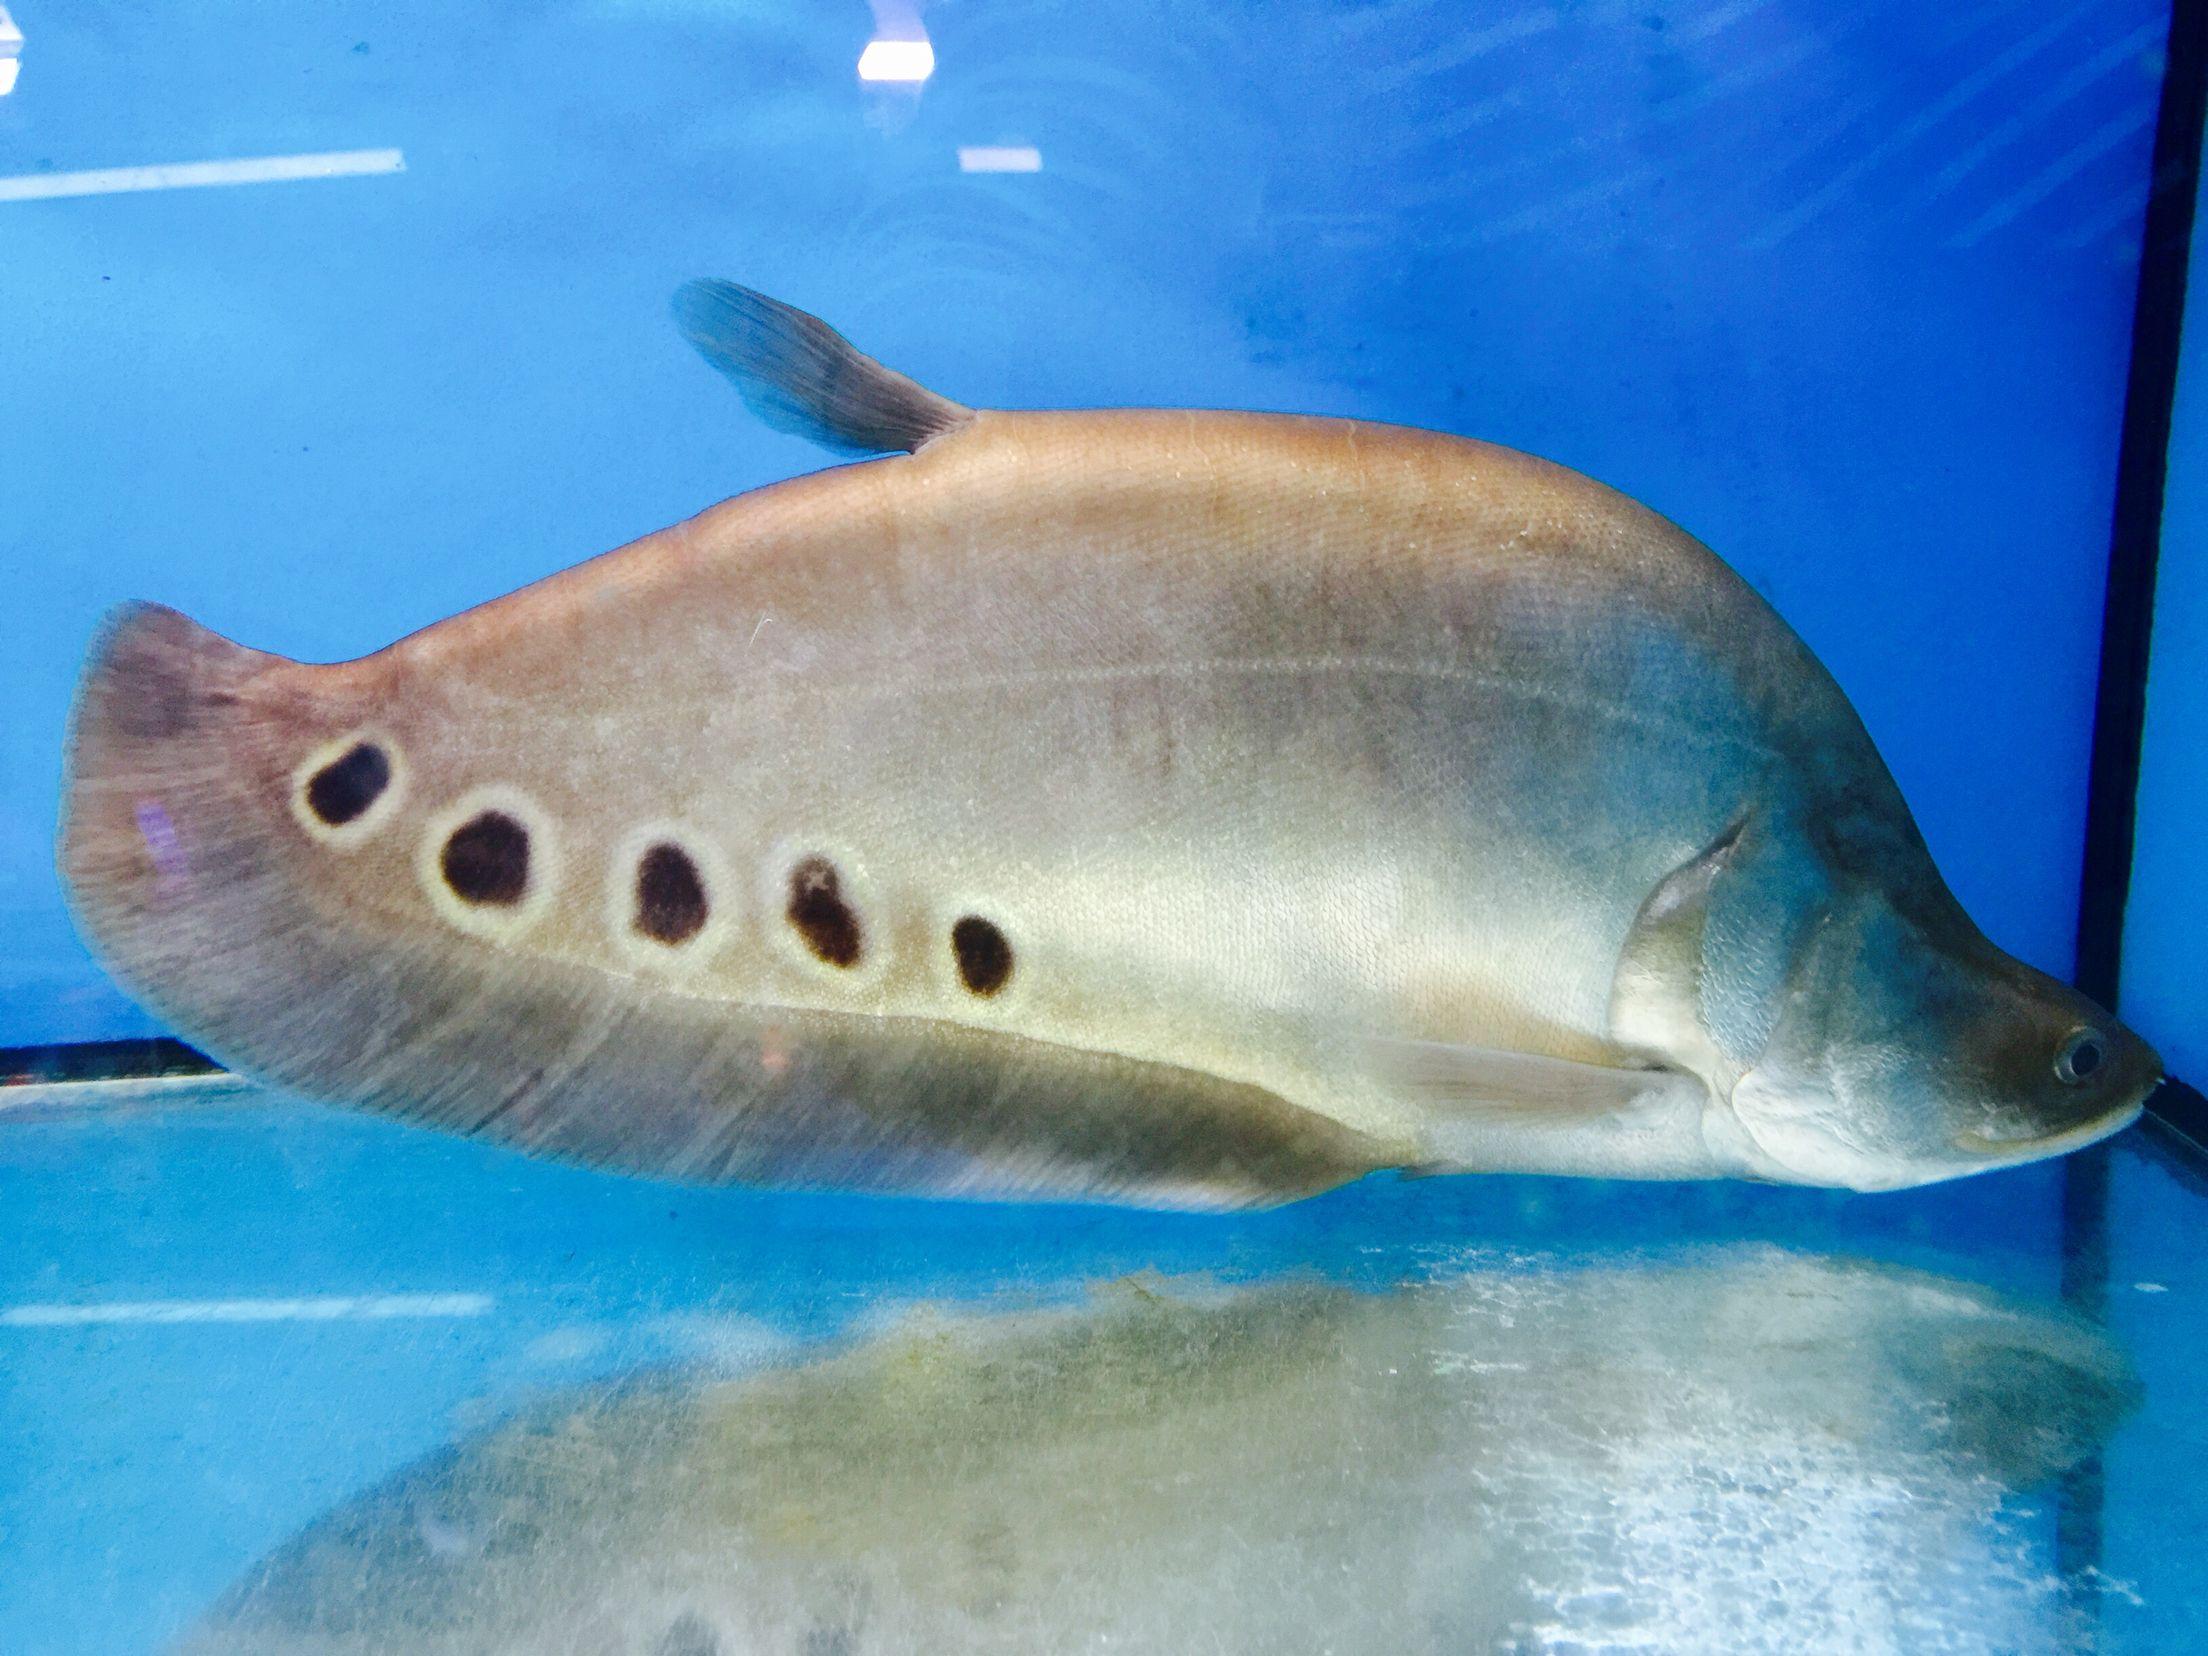 Freshwater aquarium knife fish - Fish Clown Knife Fish Freshwater Aquariumaquarium